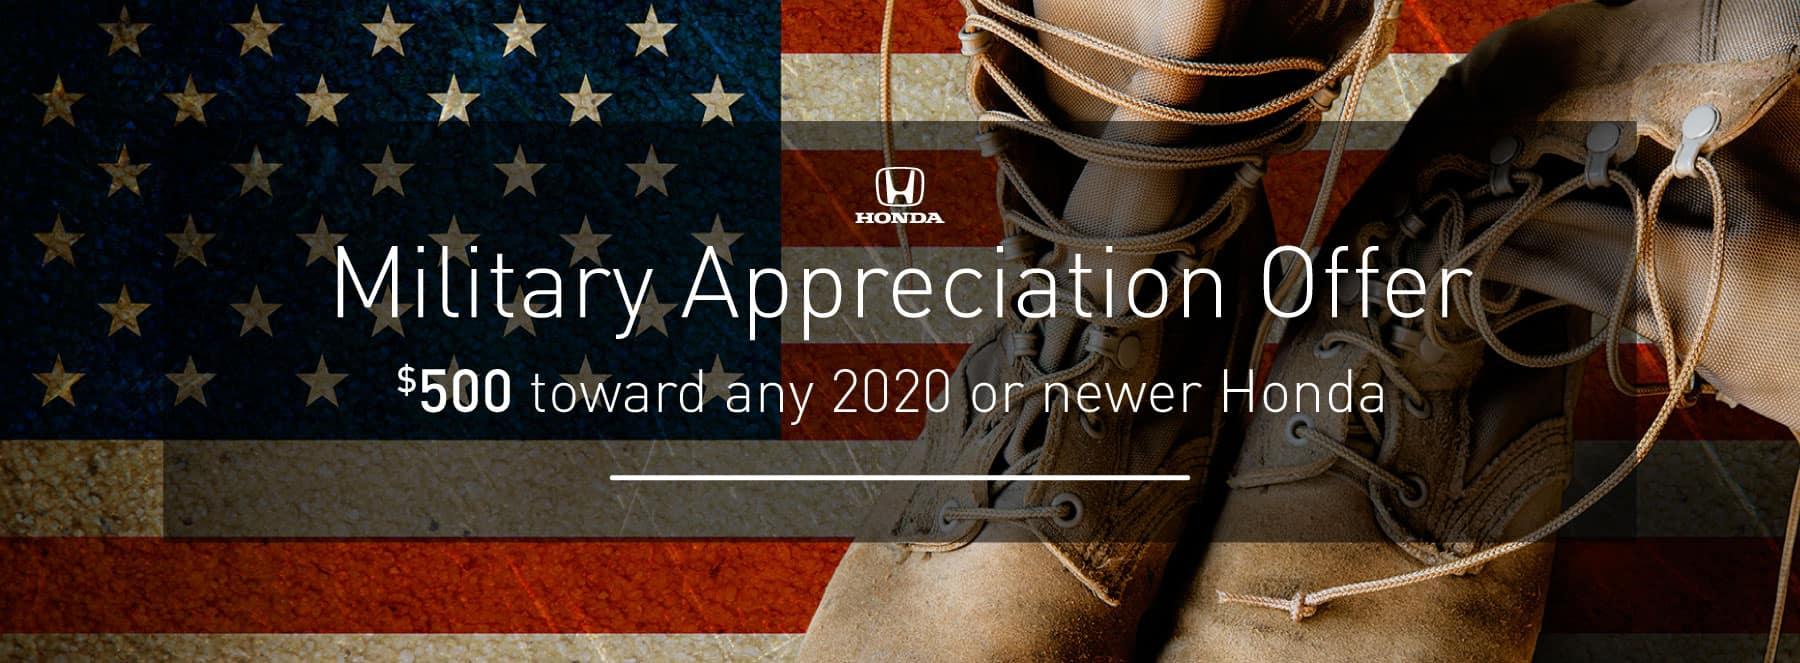 Honda Military Offer - $500 toward any 2020 or newer Honda